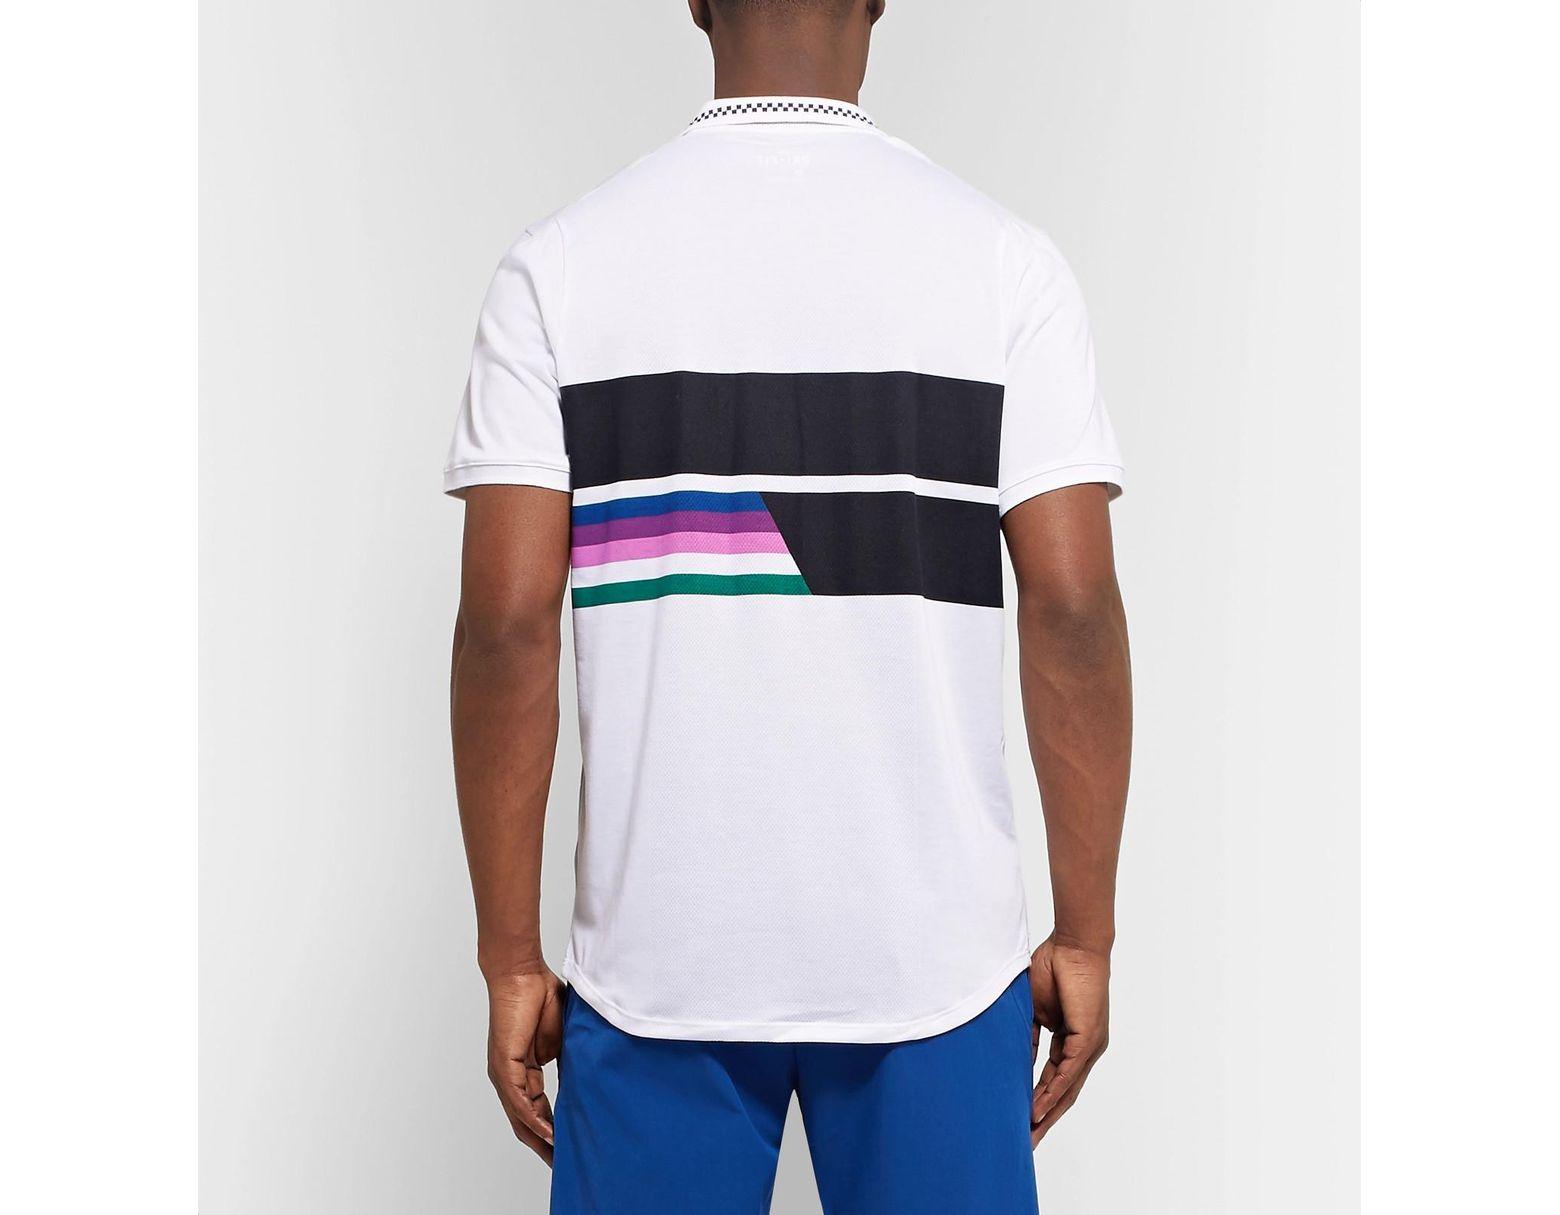 7aba11929 Nike Nikecourt Advantage Printed Dri-fit Tennis Polo Shirt in White for Men  - Lyst